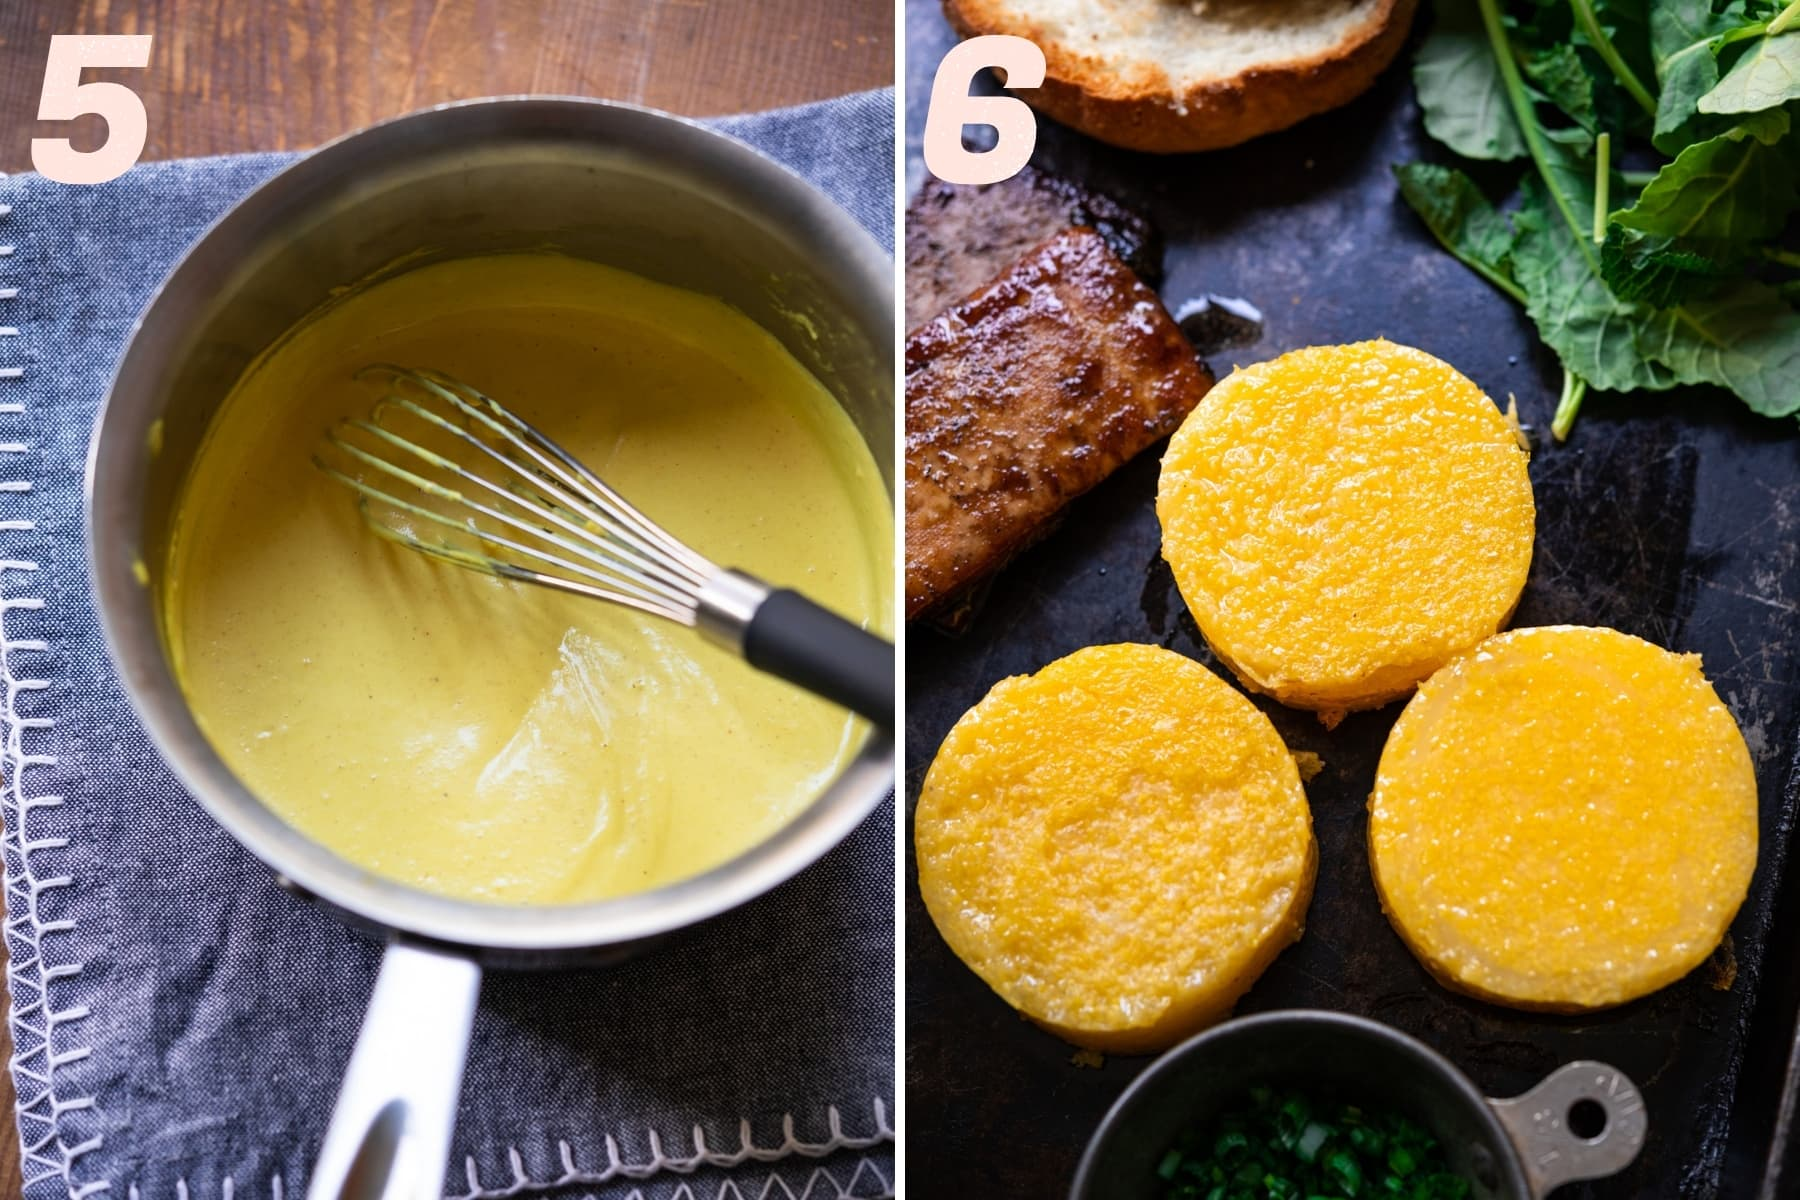 on the left: vegan hollandaise sauce in a pot. on the right: sautéed polenta rounds.